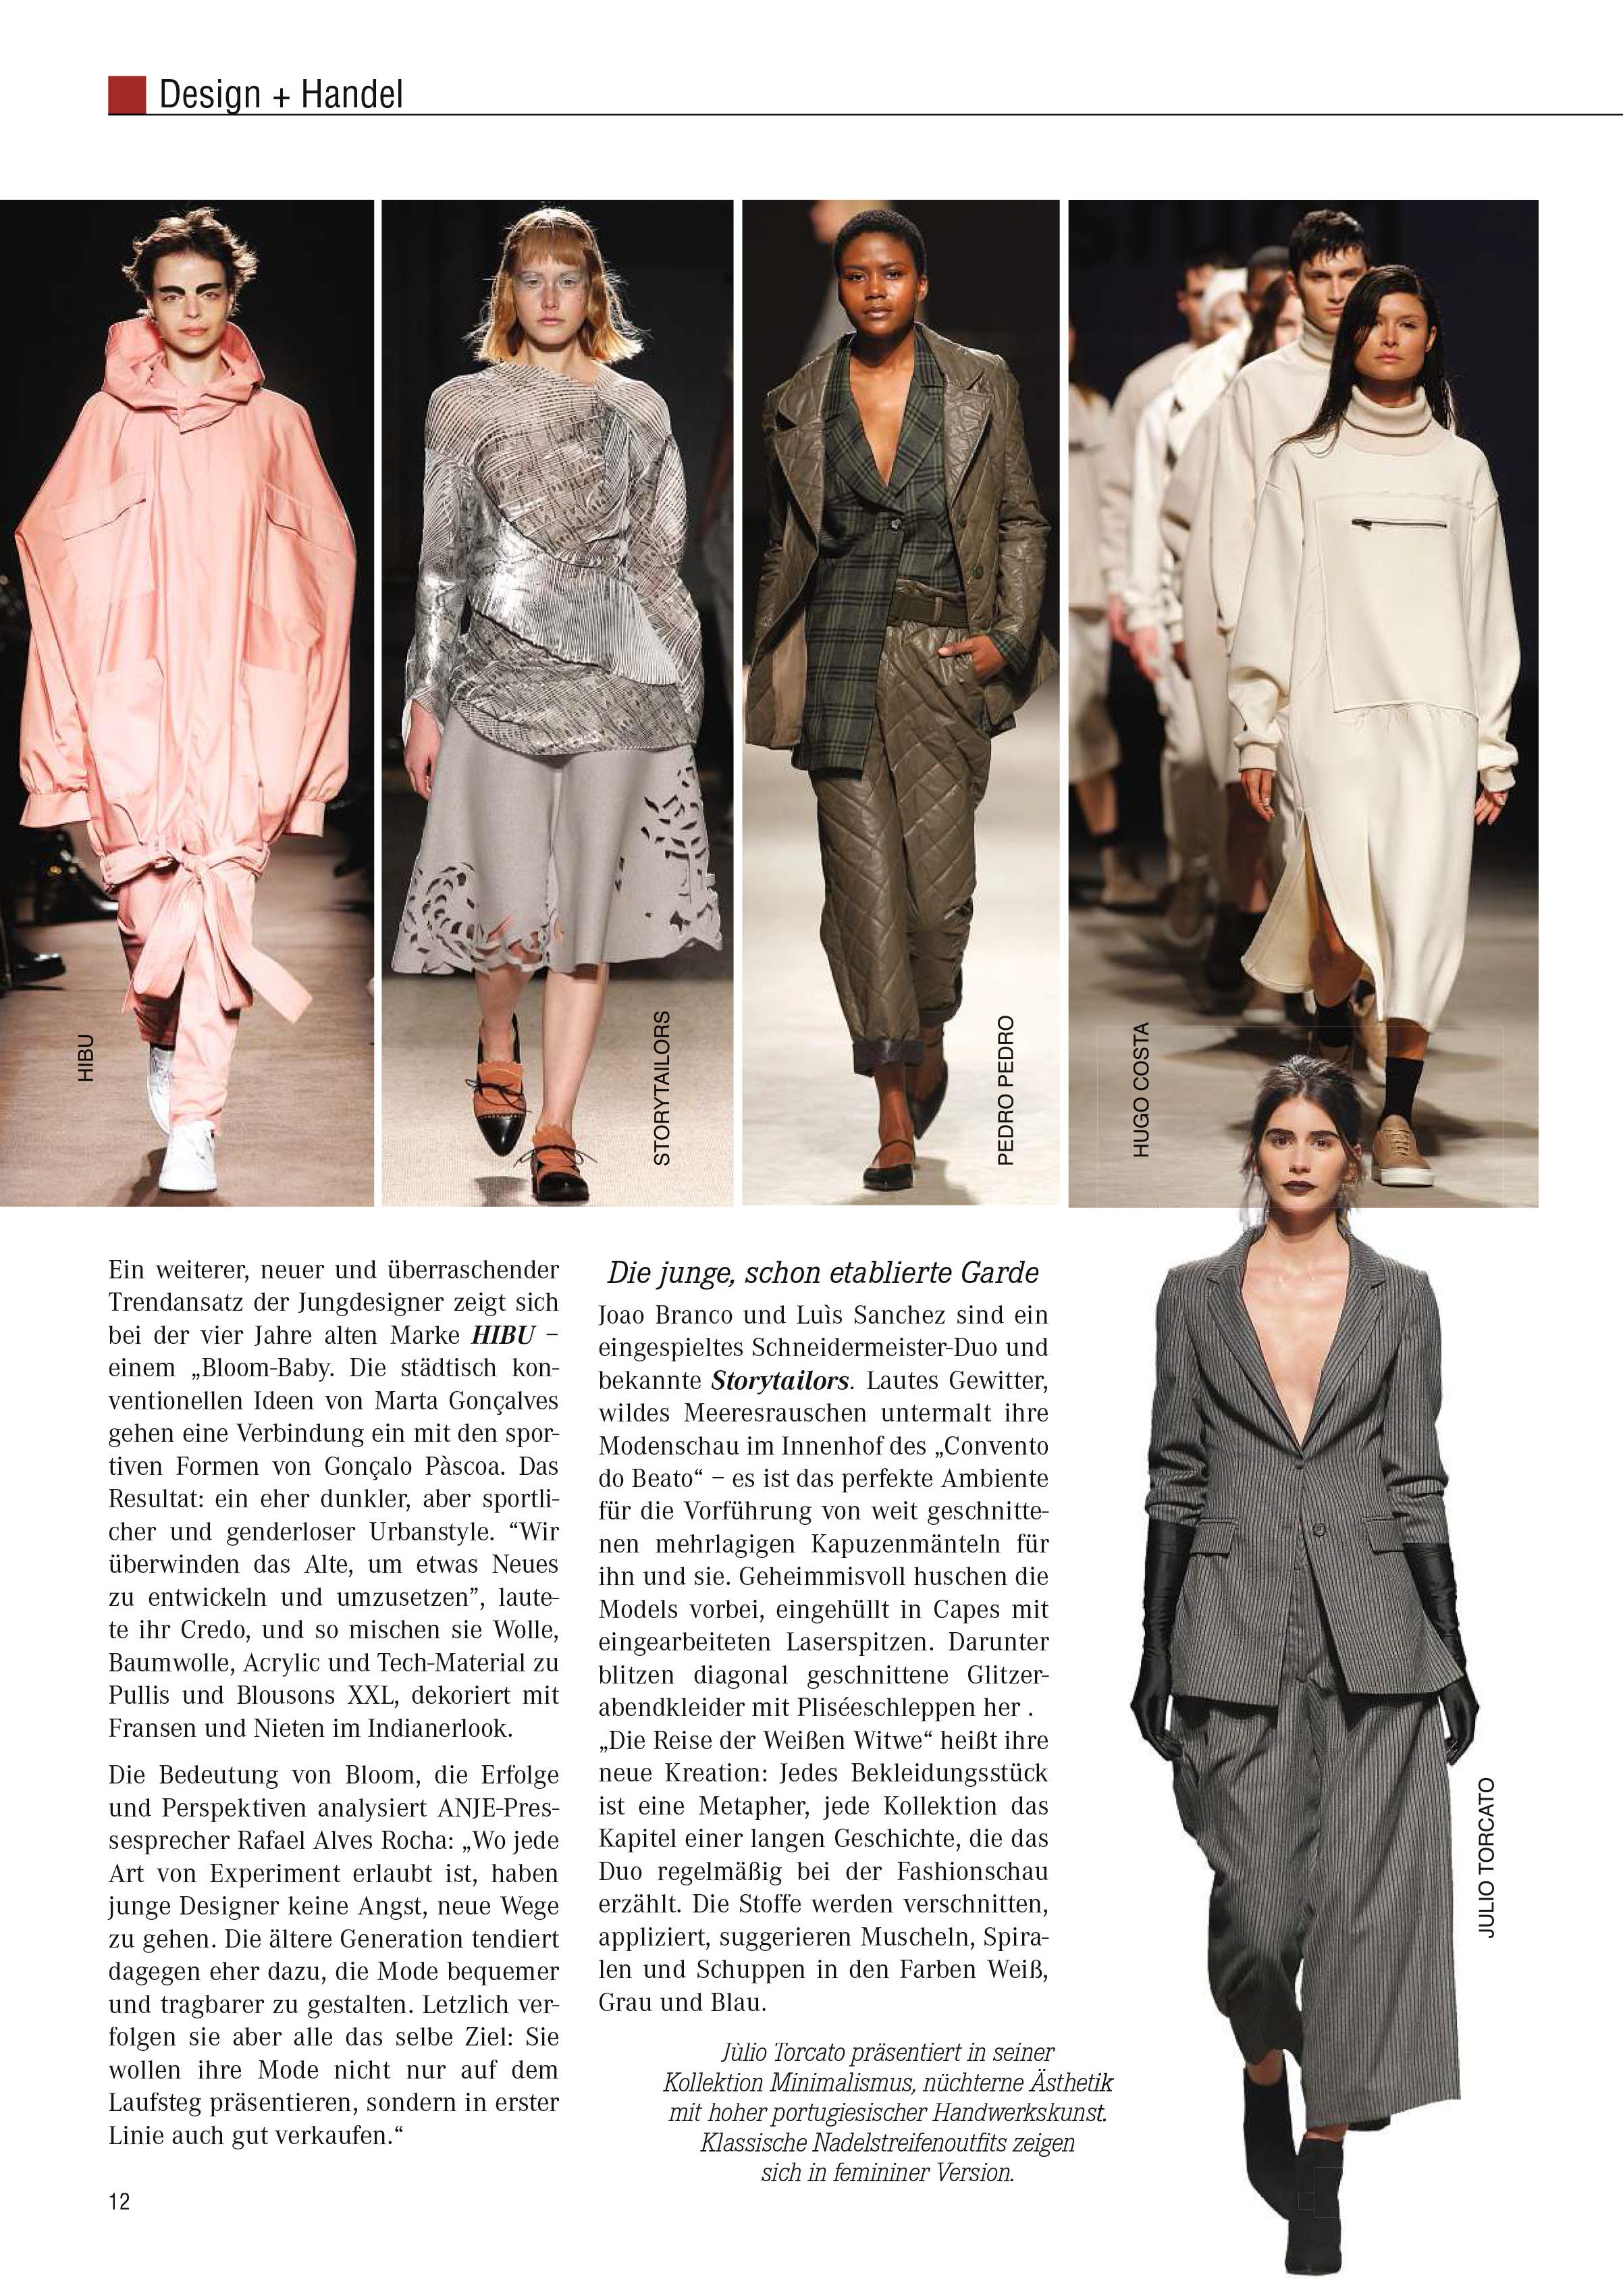 Dundschau-german-magazin-woman-Portugal-Fashion-pag-12-2016-11